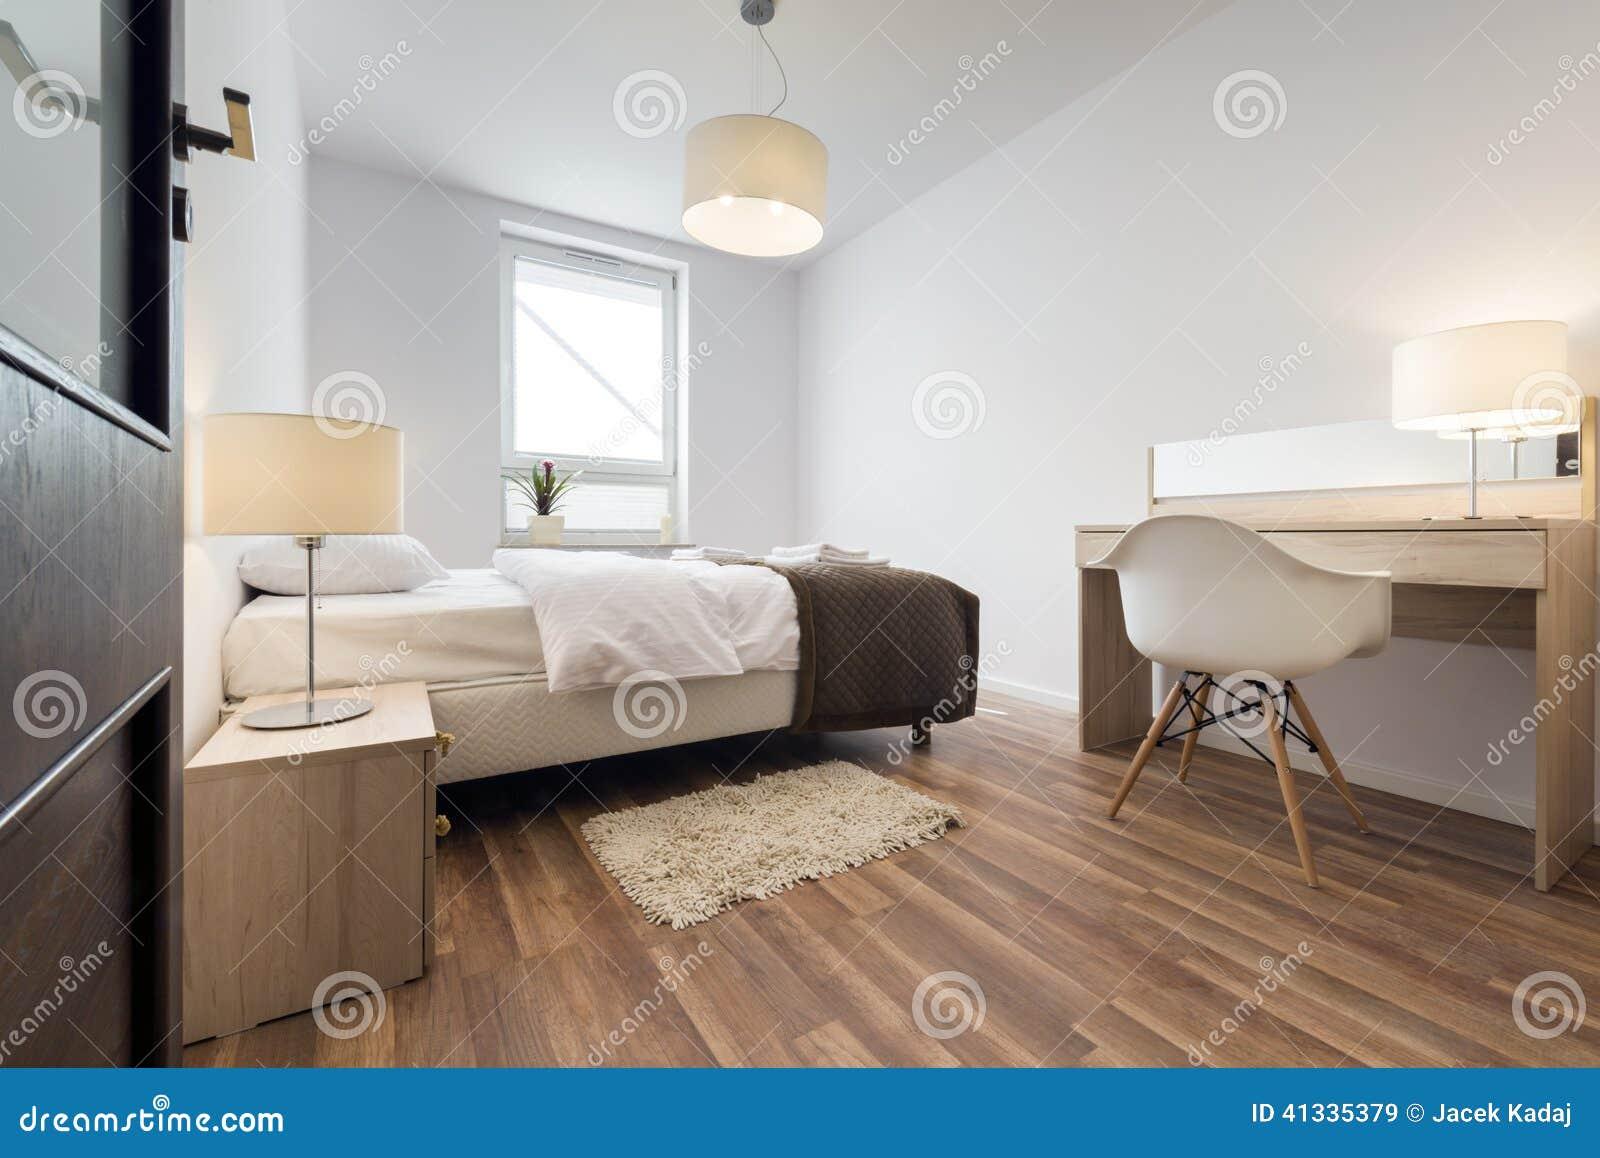 Chambre a coucher style scandinave for Chambre nordique